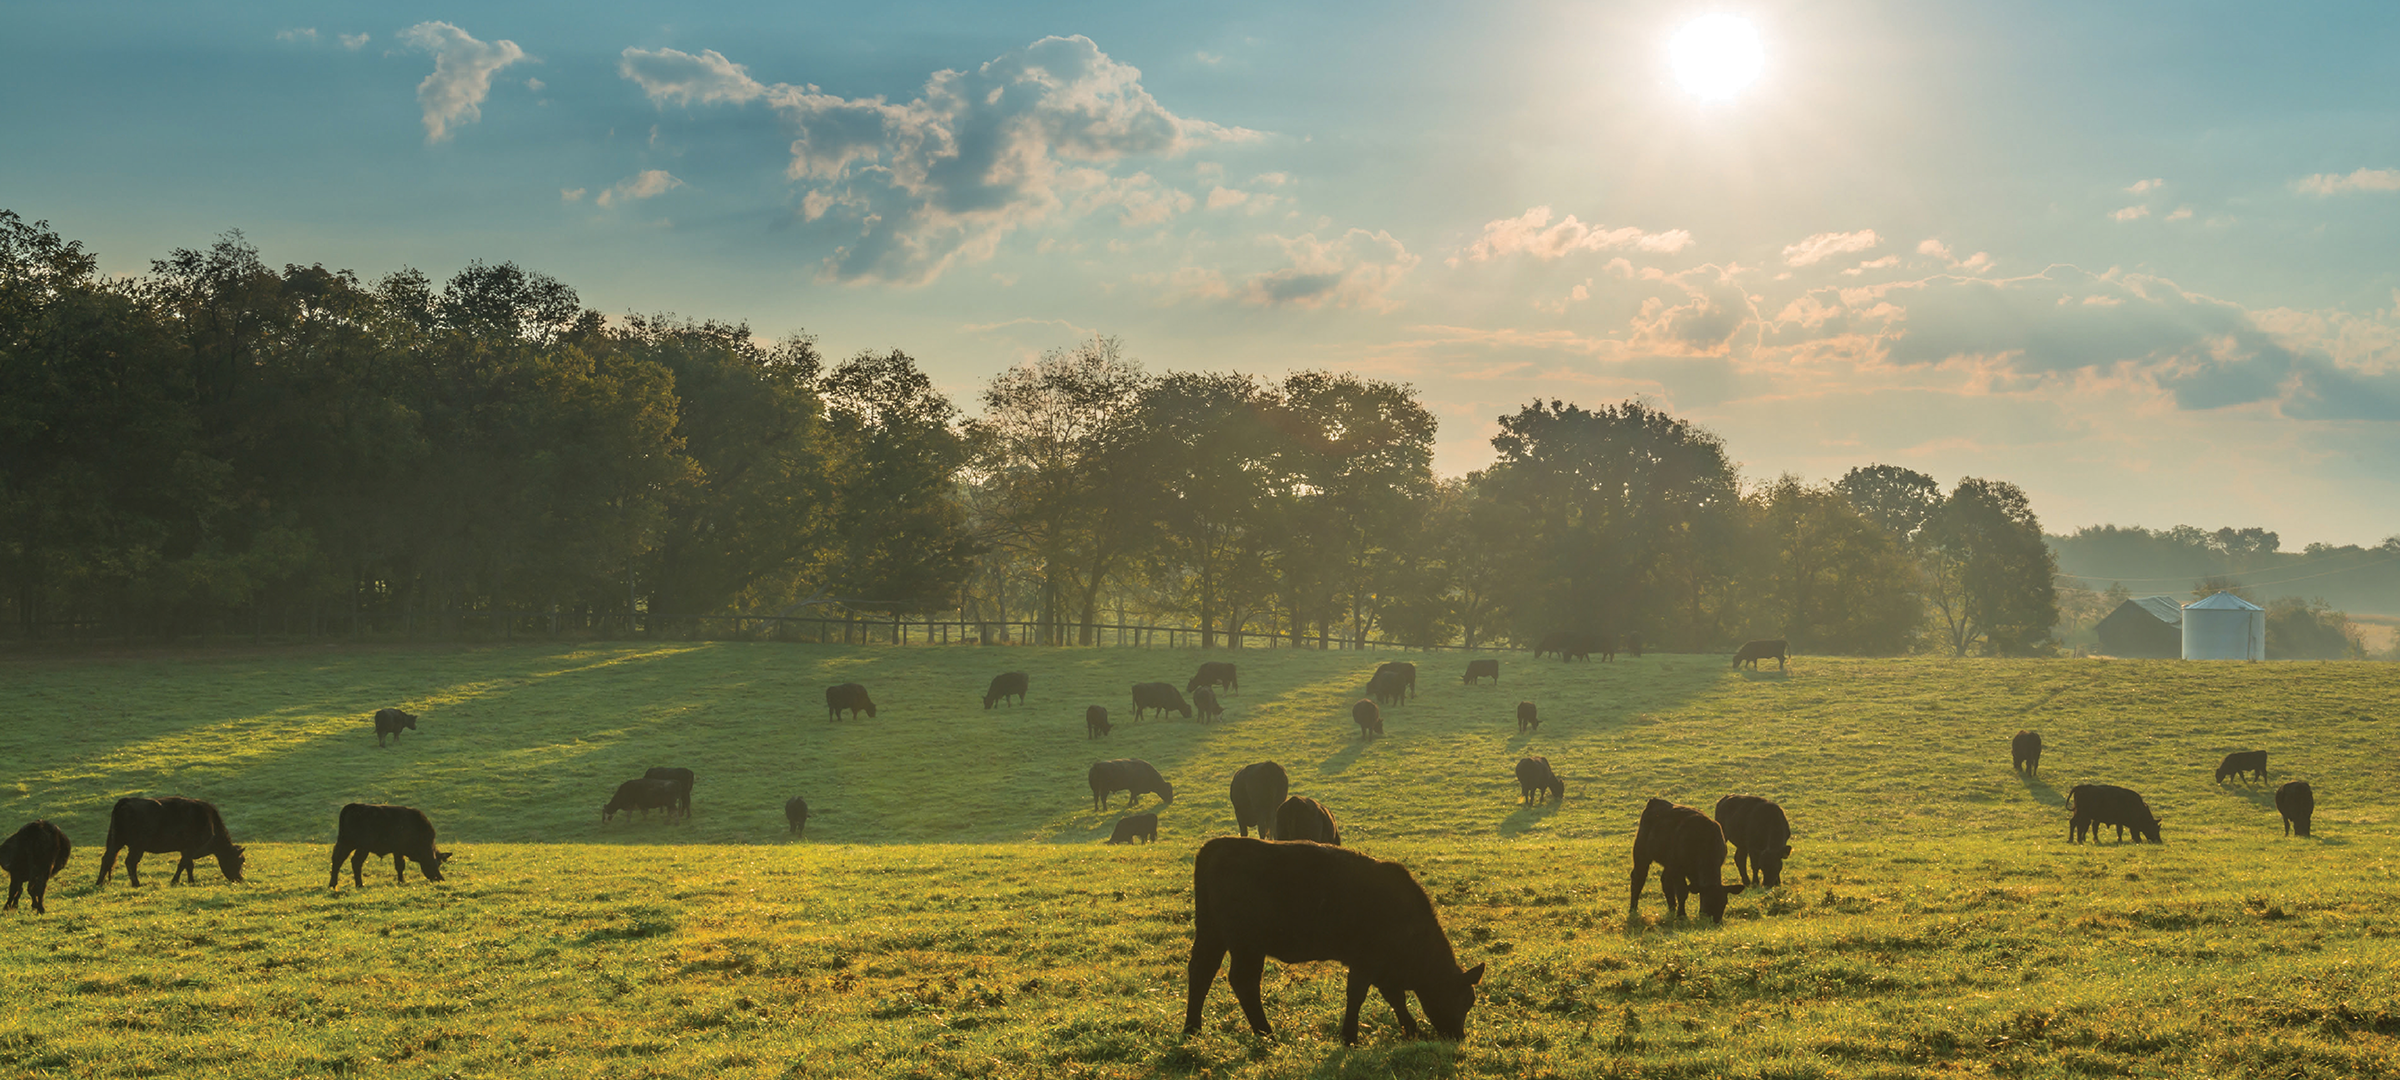 cattle grazing on pureland america farm